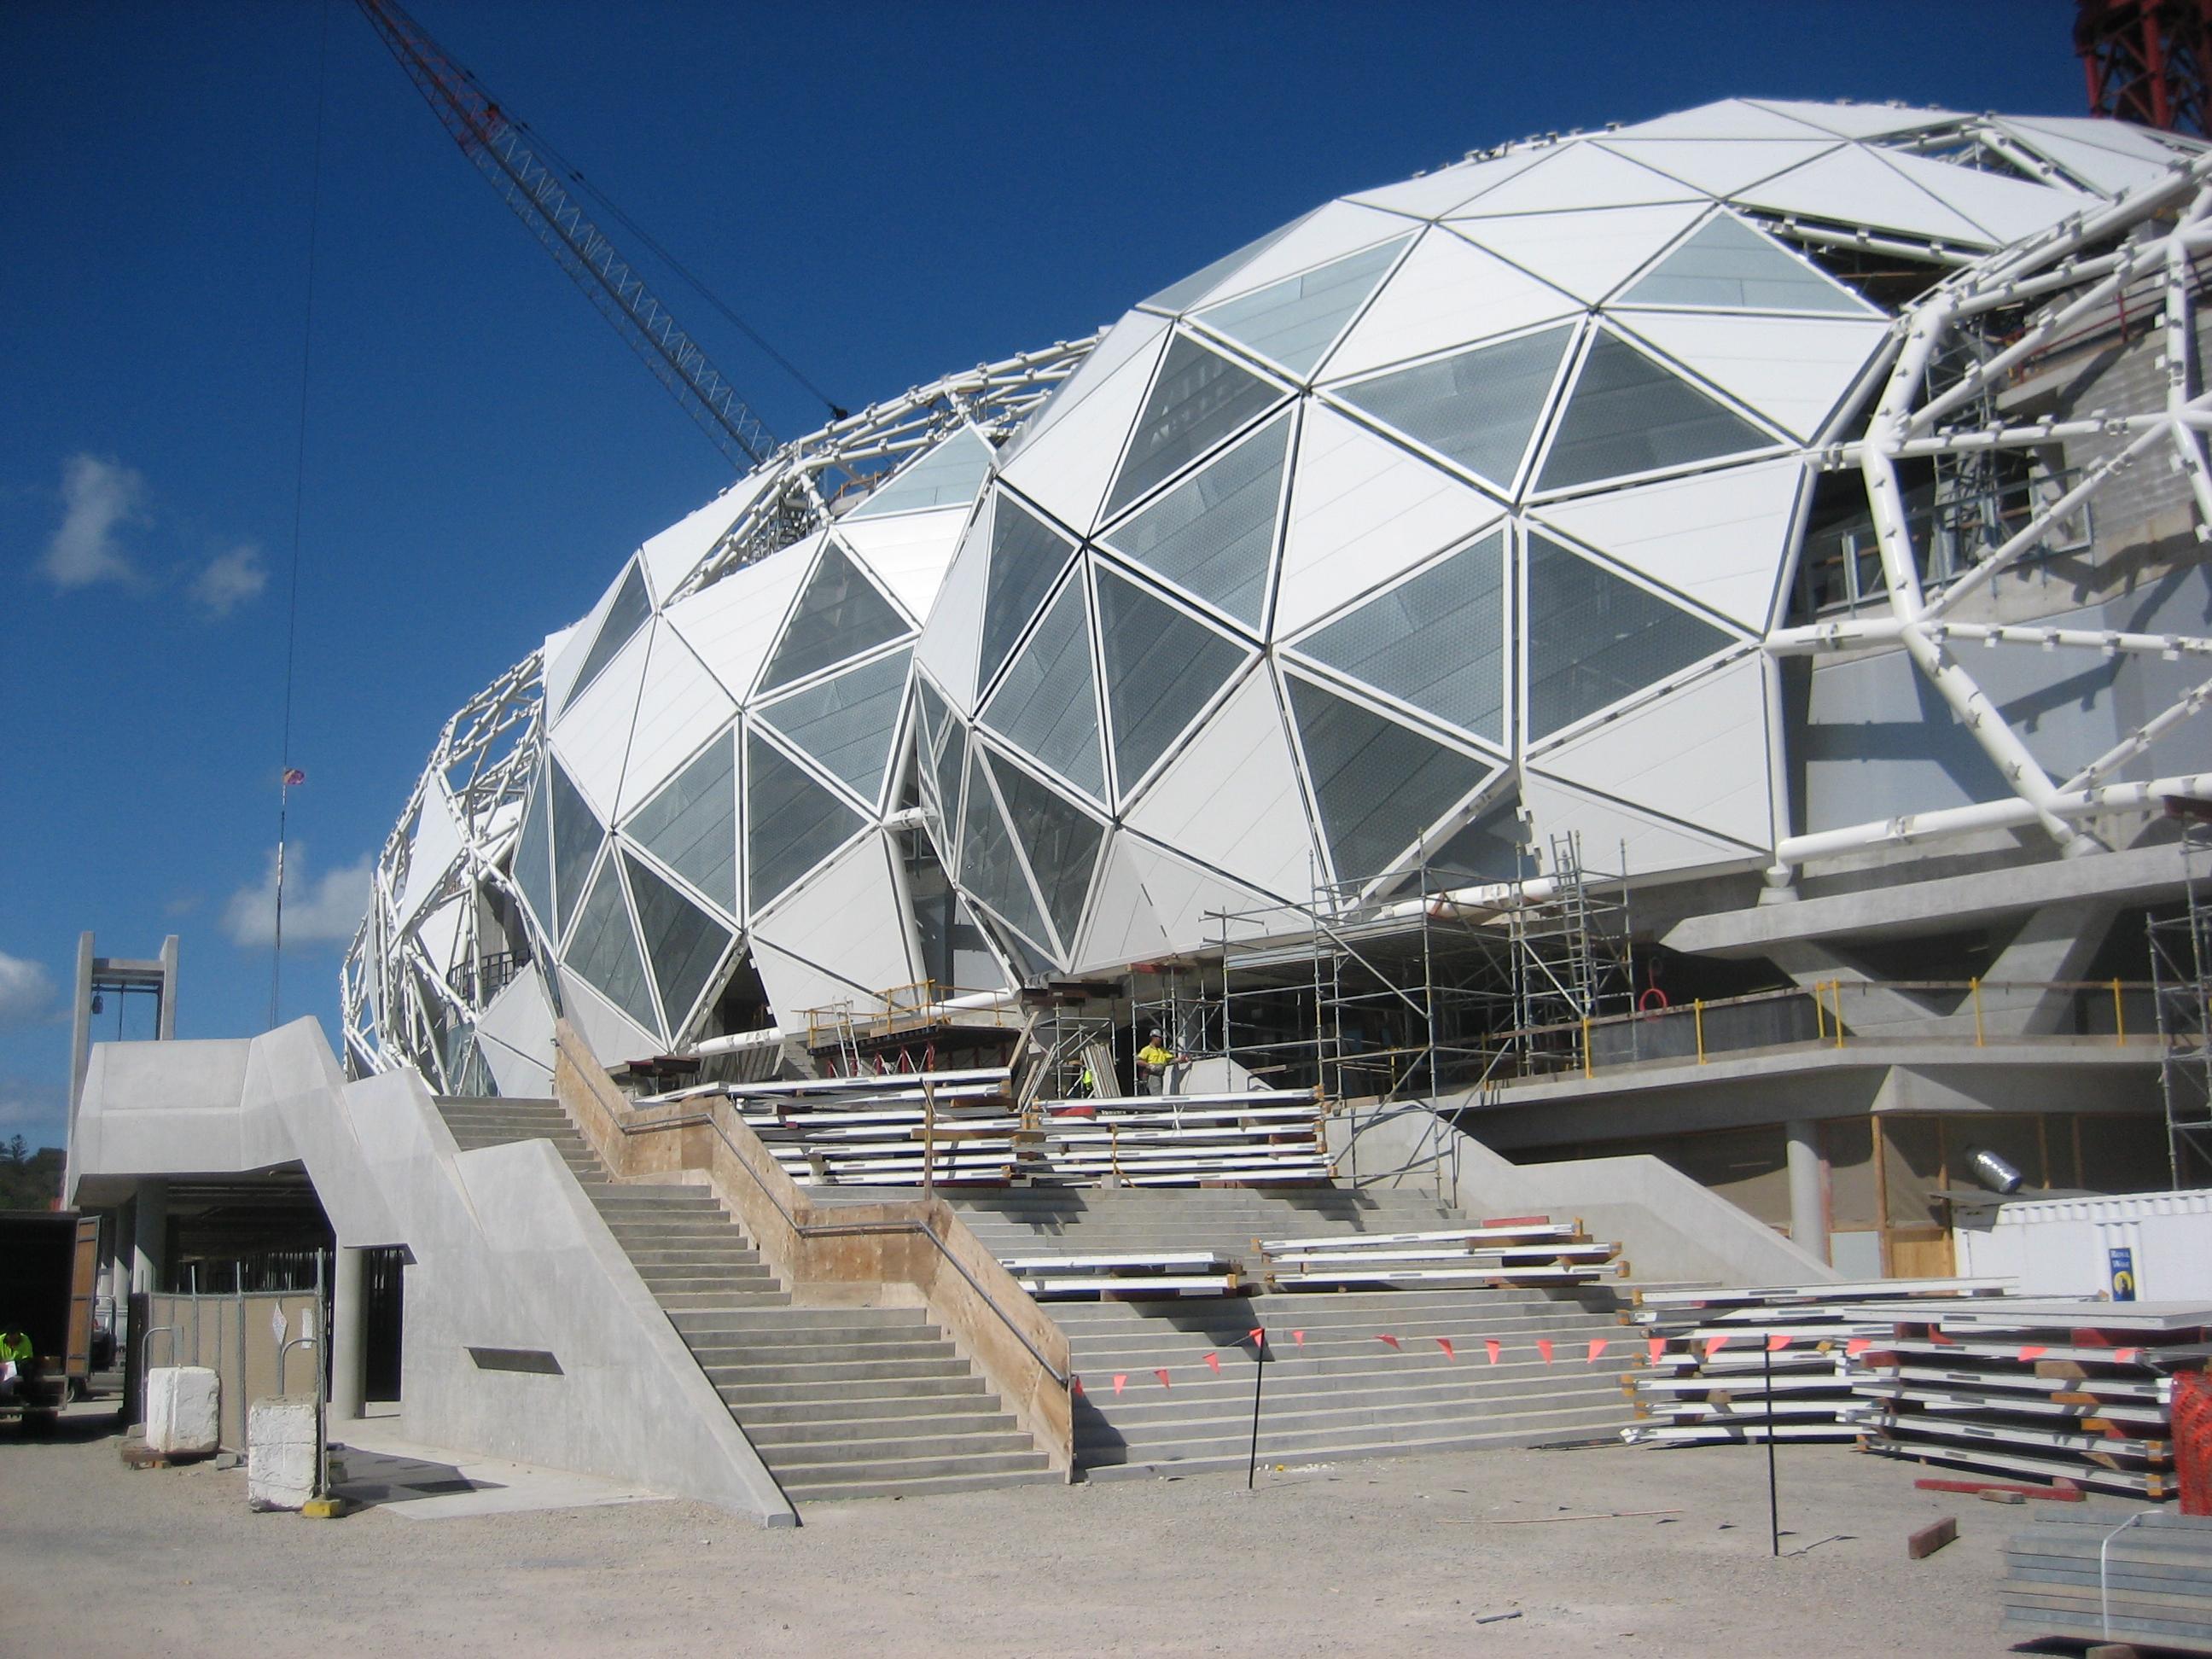 Thyssenkrupp Provides Materials For Revolutionary New Roof